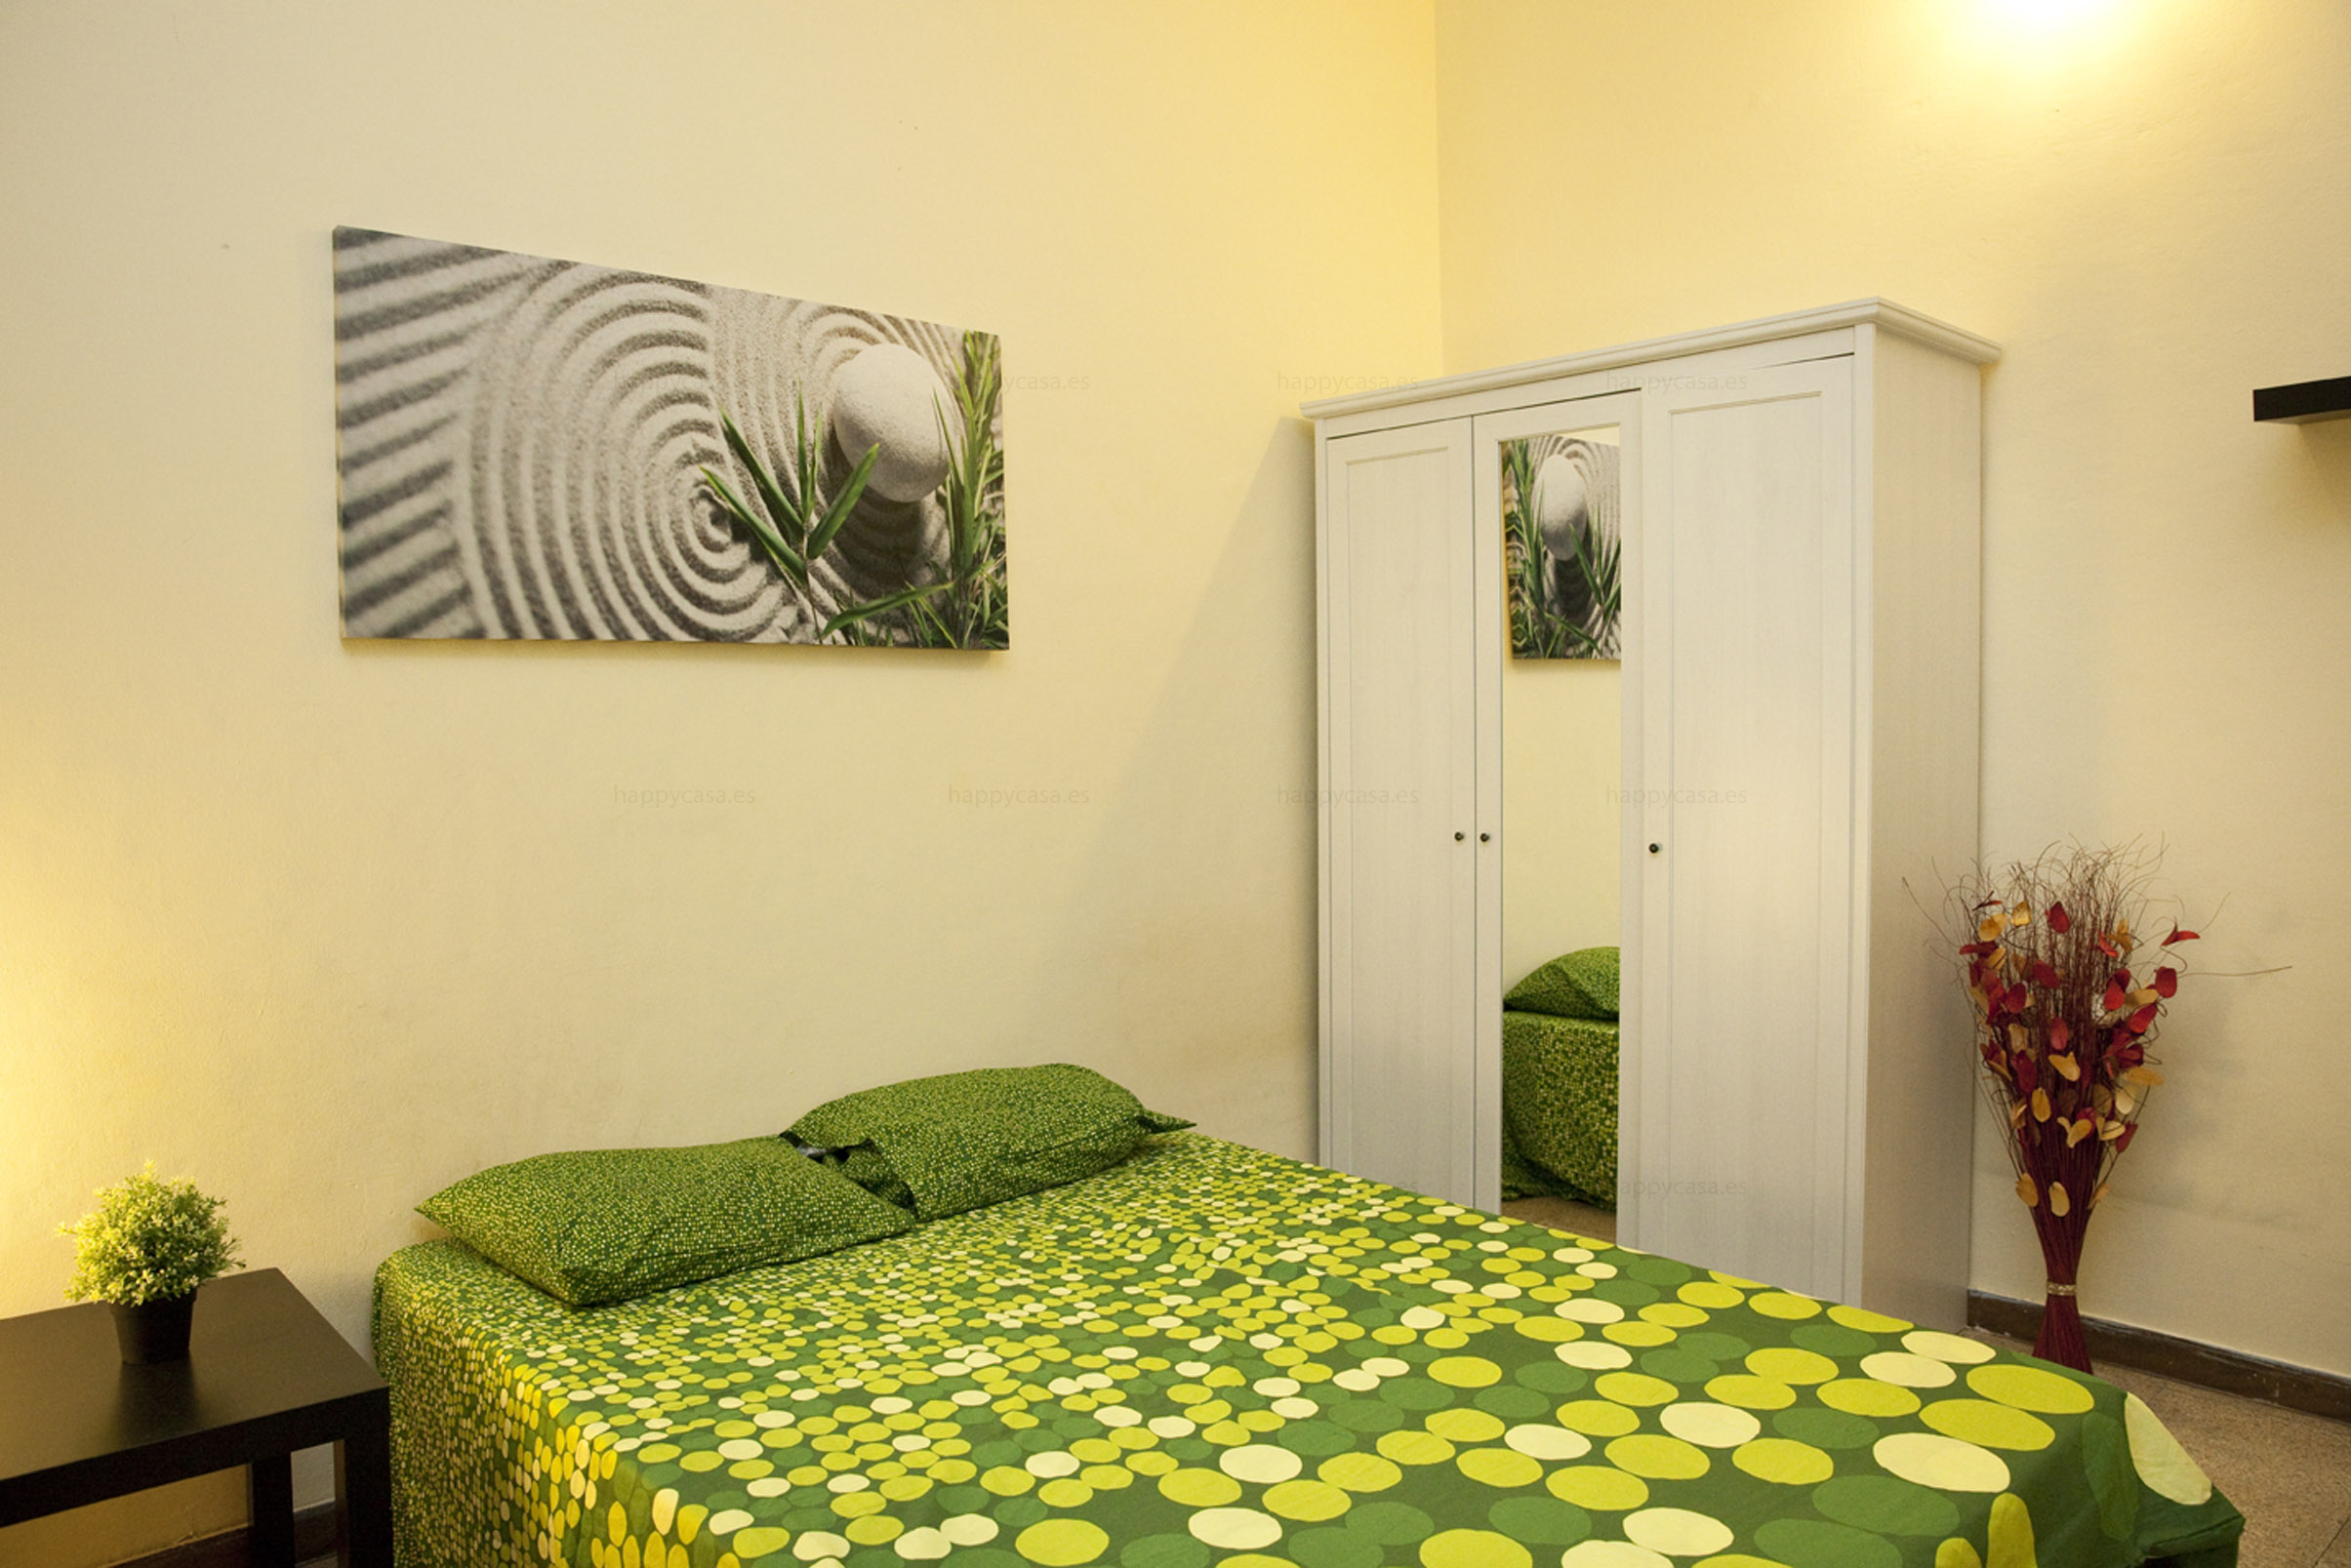 Alquilar habitaci n en barcelona cerca plaza for Habitacion barcelona